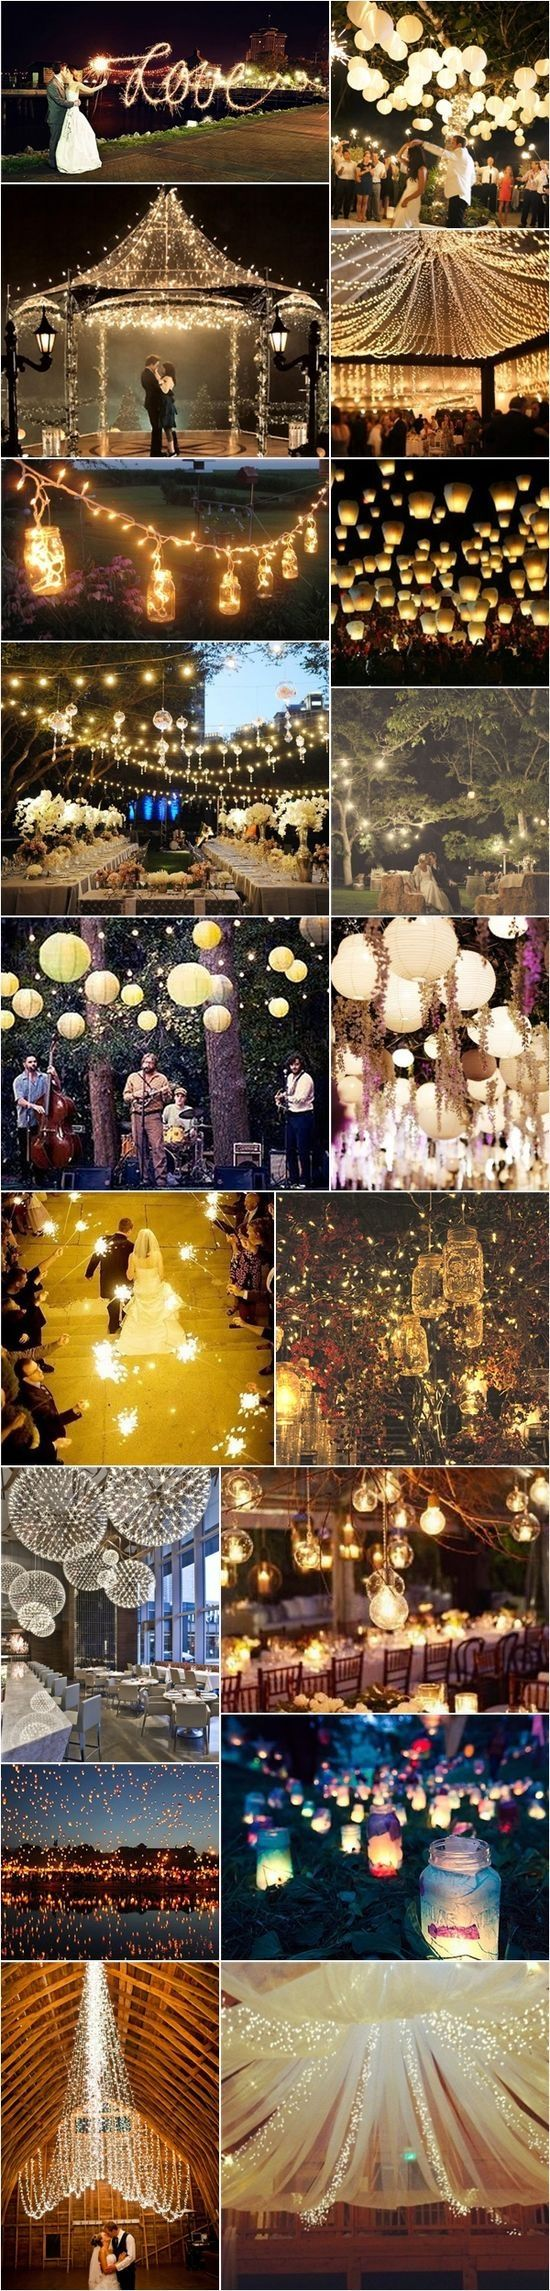 Magical wedding ideas